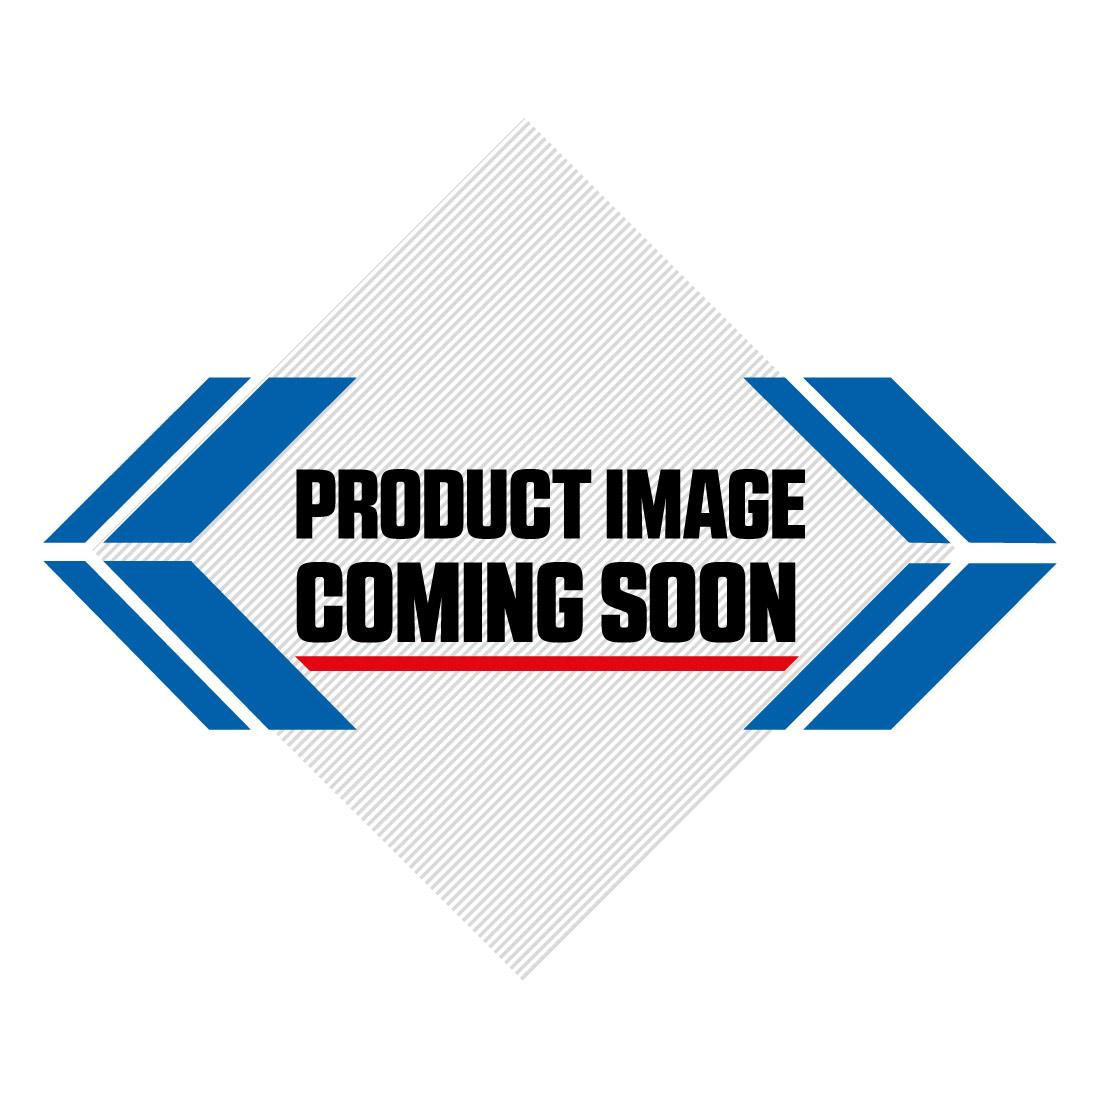 Suzuki Plastic Kit Suzuki RMZ 450 (08-17) White Image-0